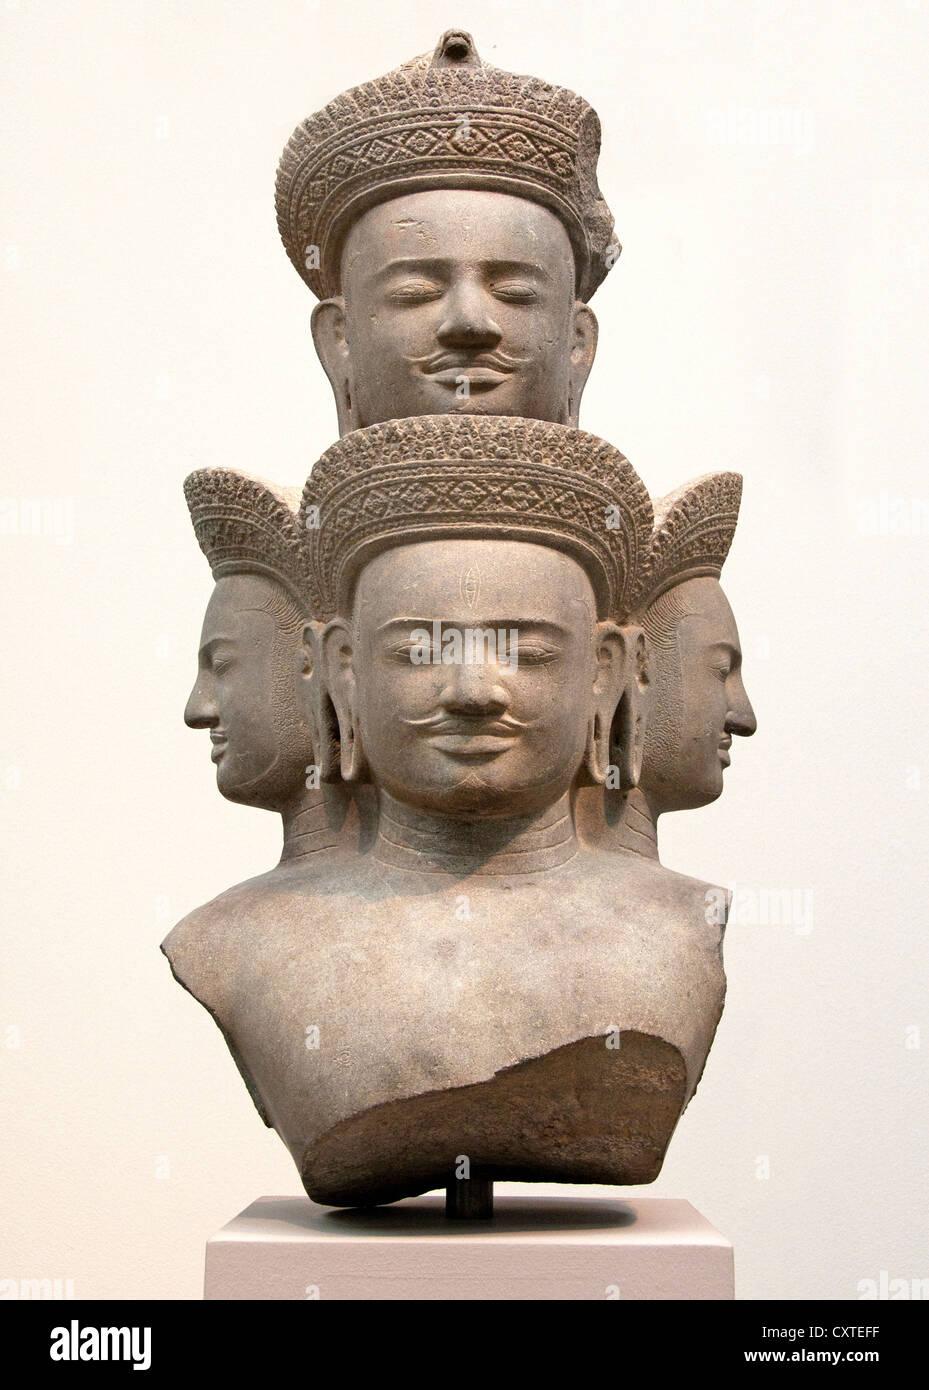 Bust of Five Headed Shiva Angkor 10th century Cambodia 80 cm - Stock Image